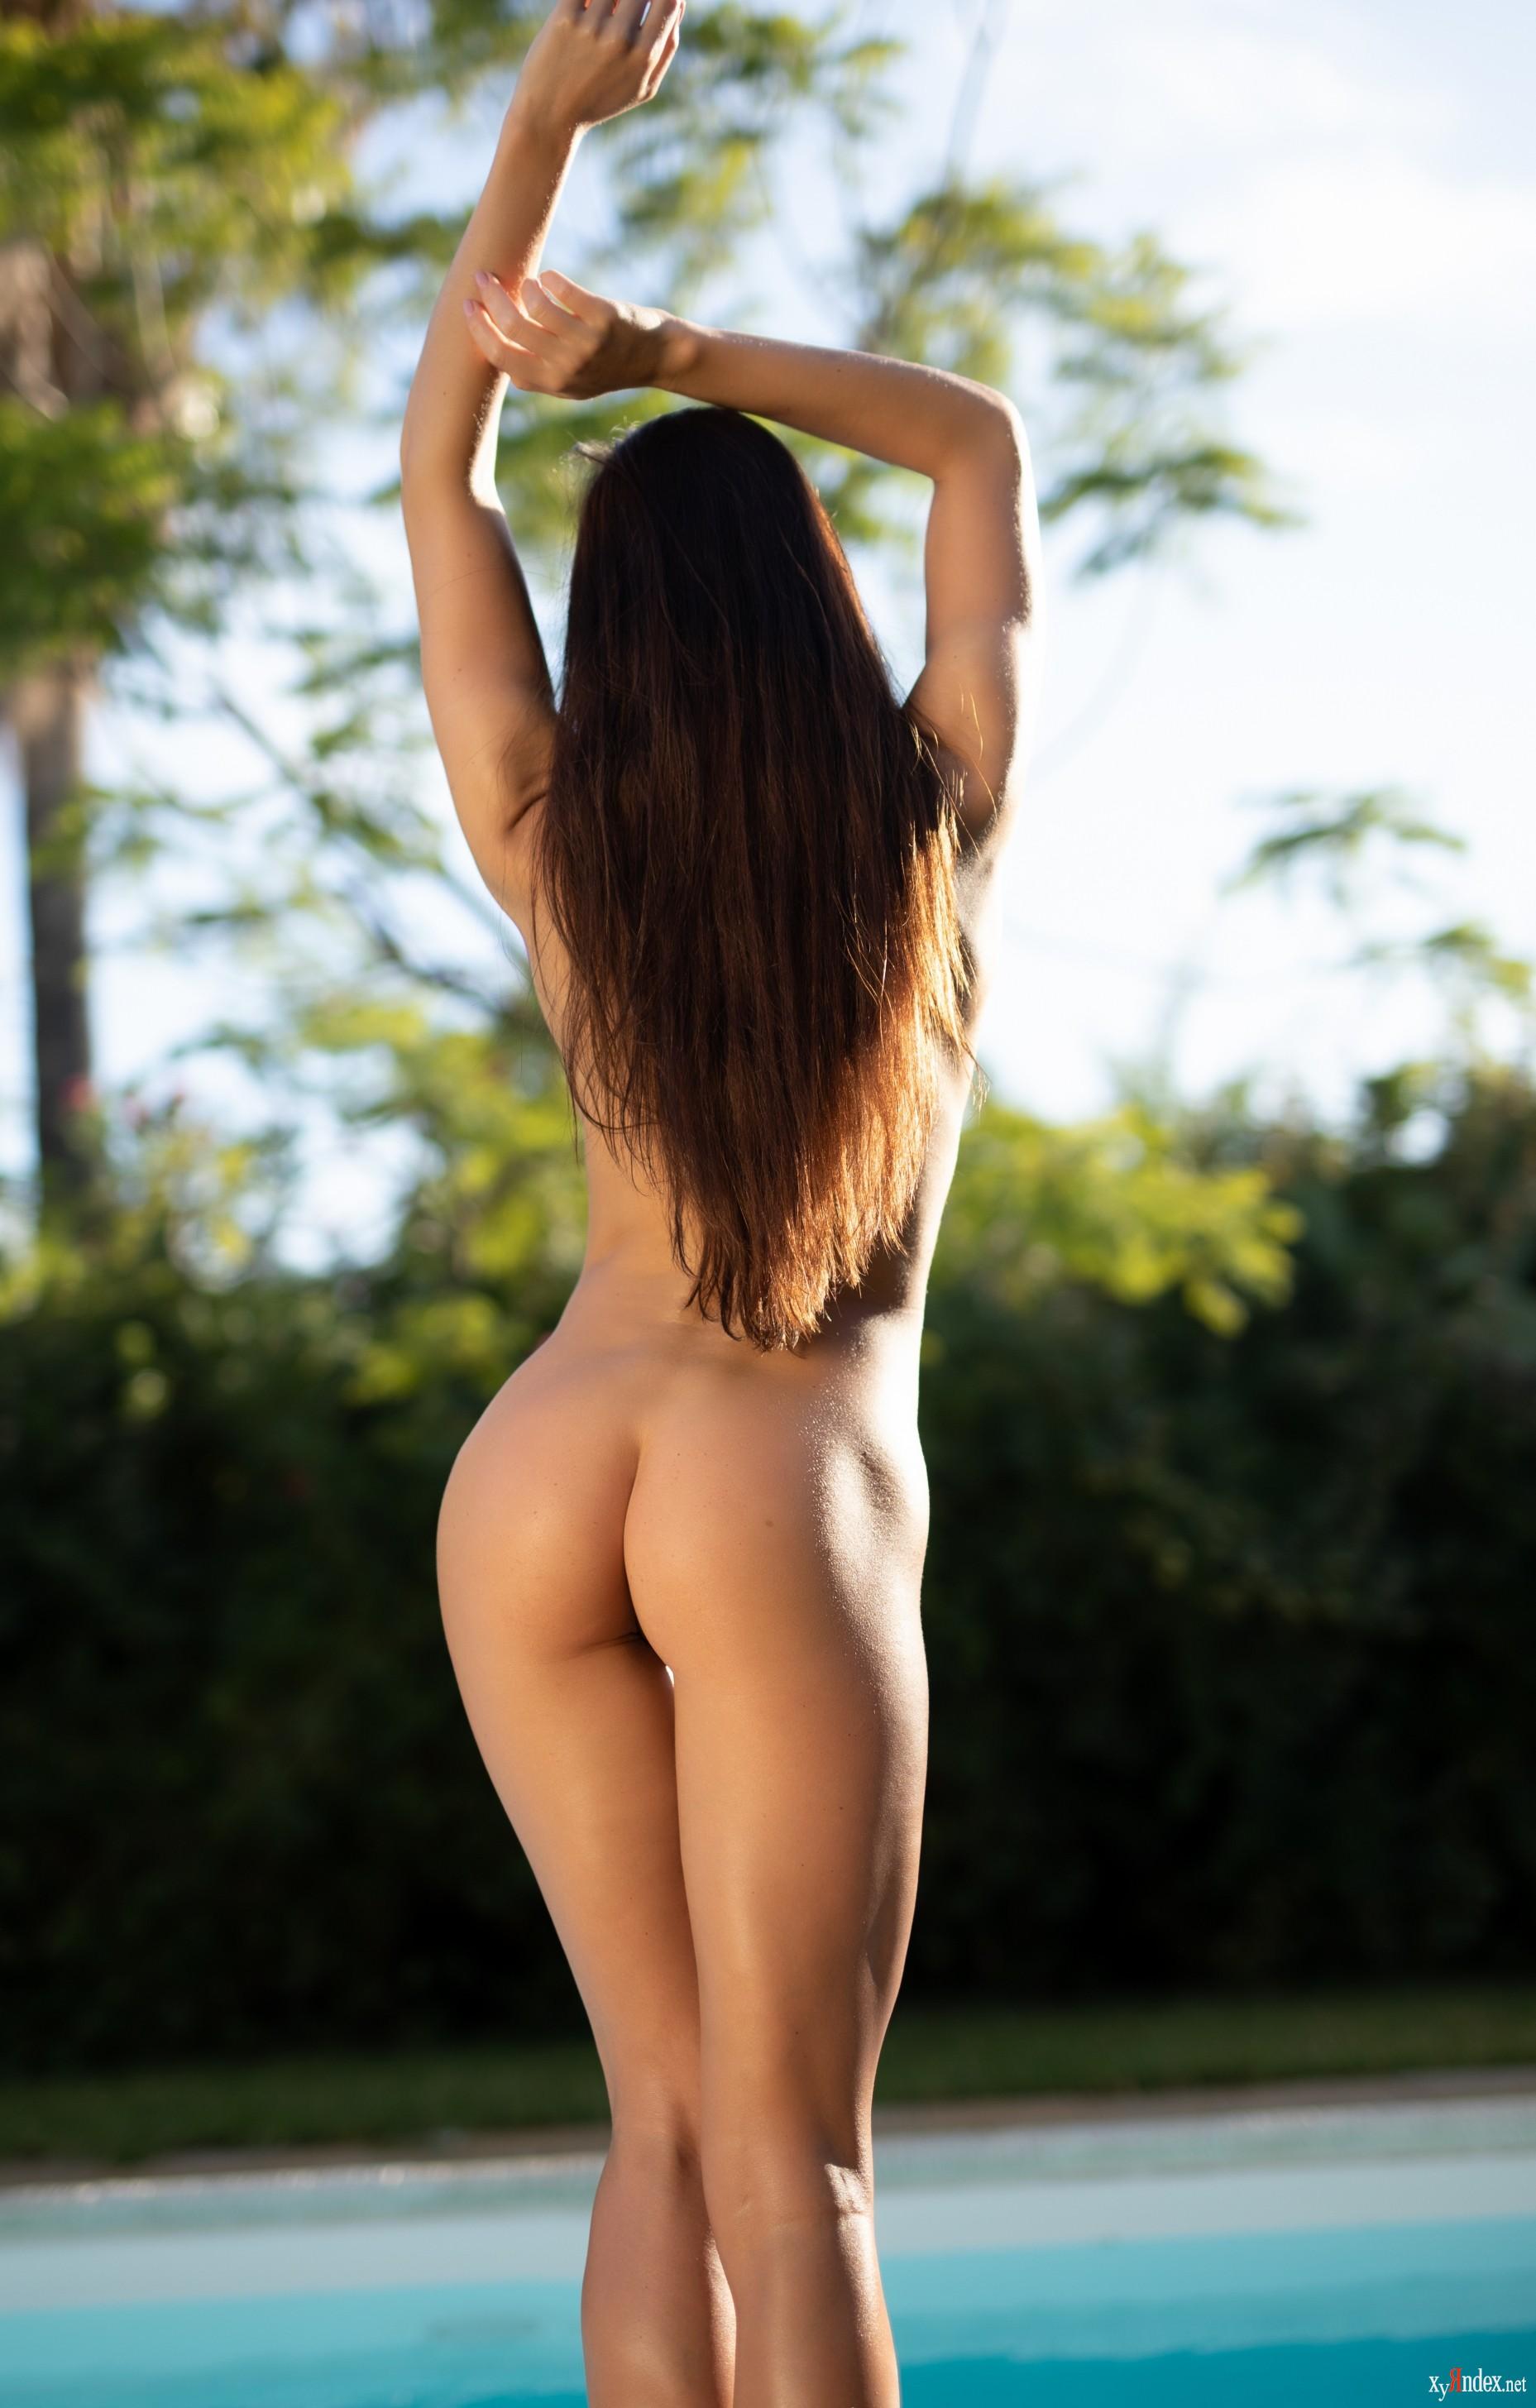 https://xyya.net/uploads/posts/2020-06/1592929762_20062020-13.jpg